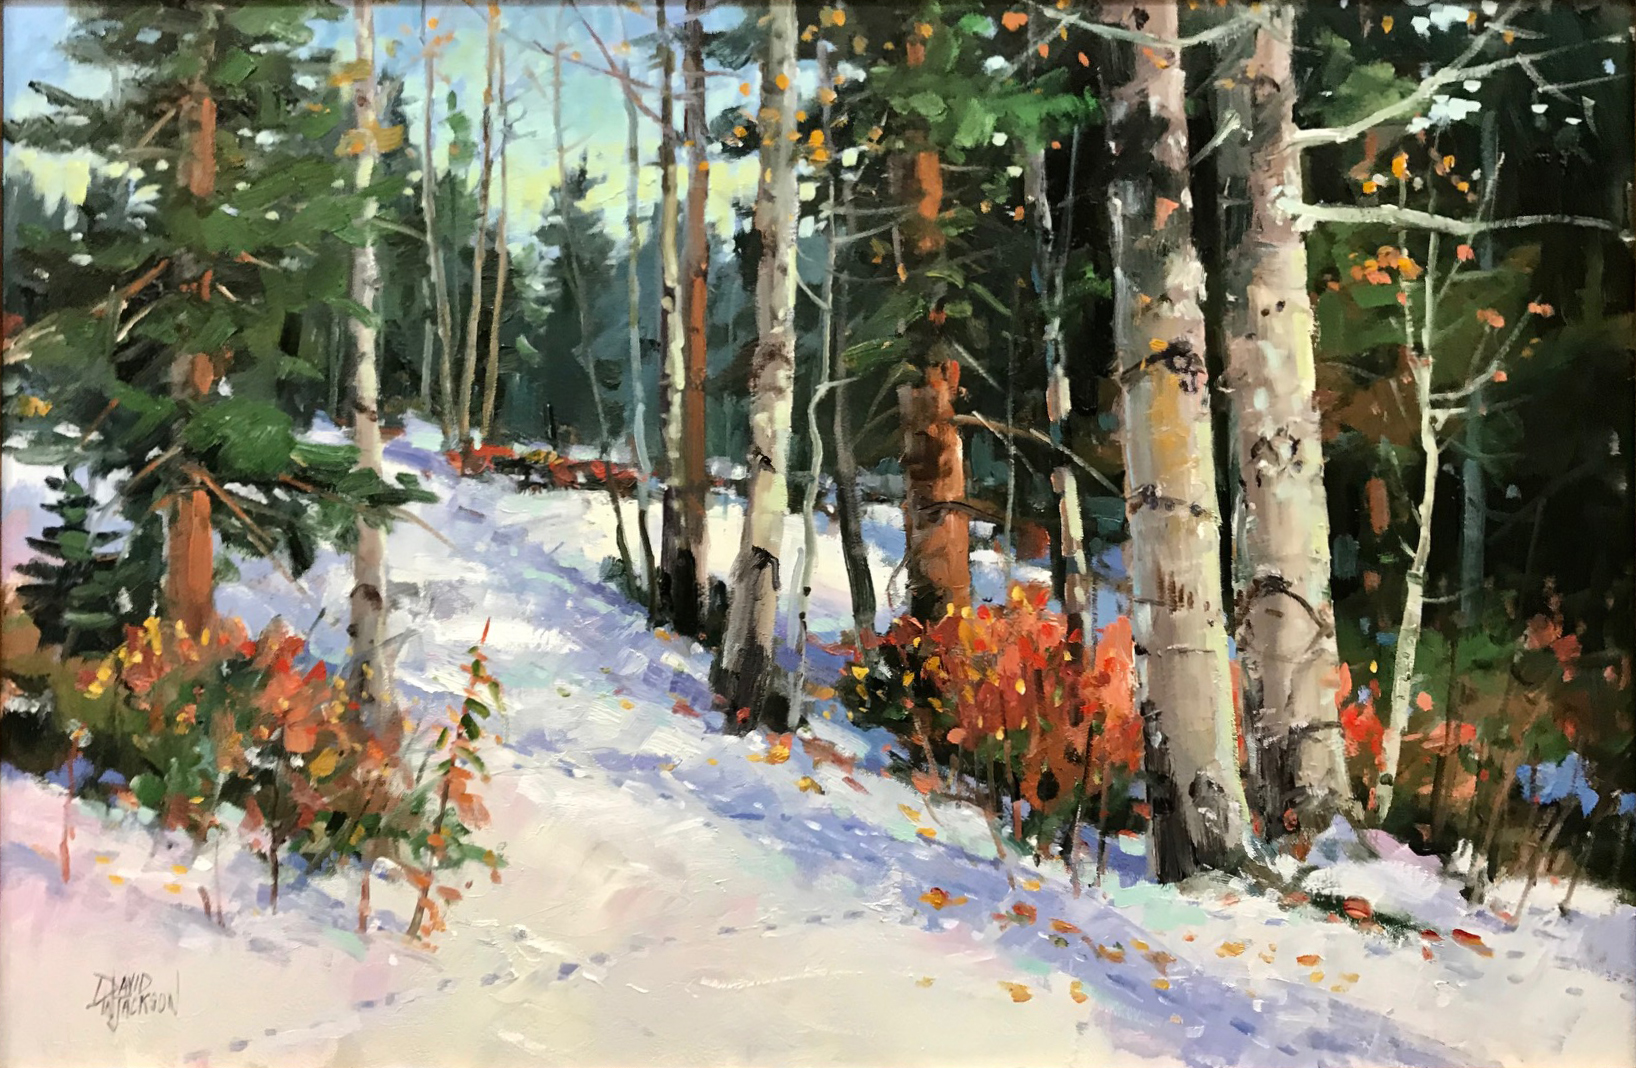 Treasures of Winter by David Jackson